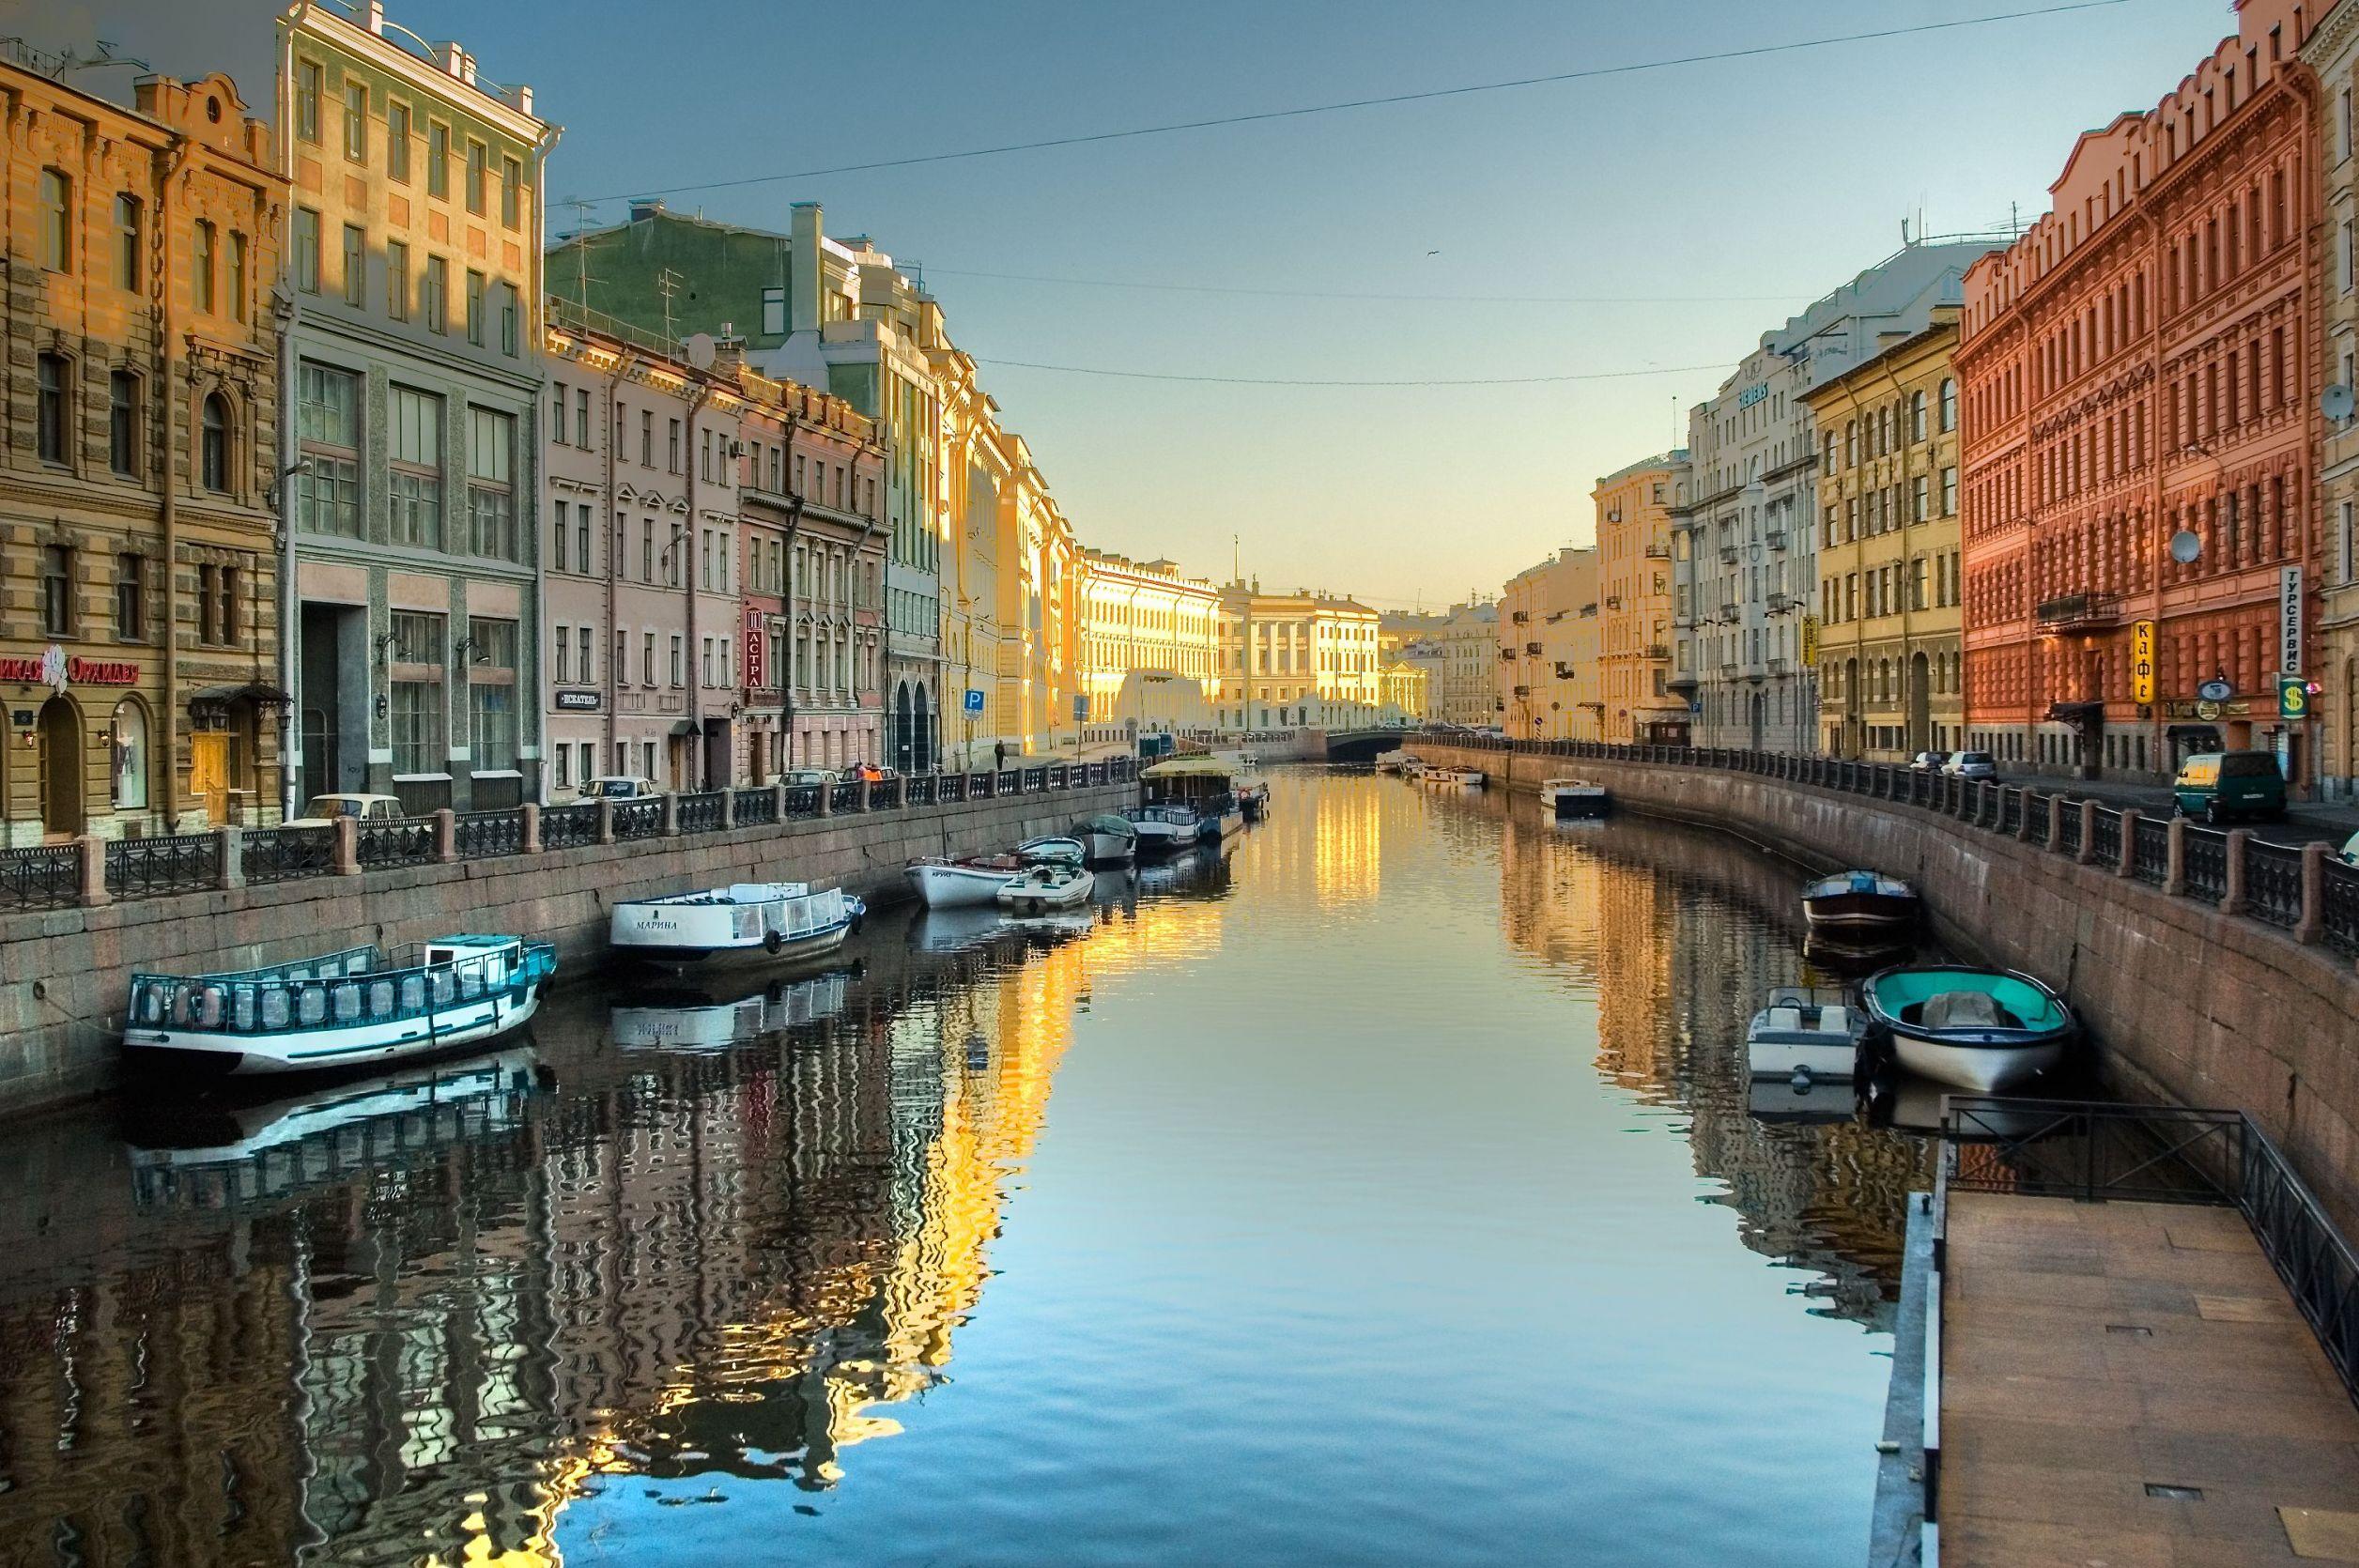 Варна санкт петербург самолетни билети купить билет на самолет тюмень-адлер